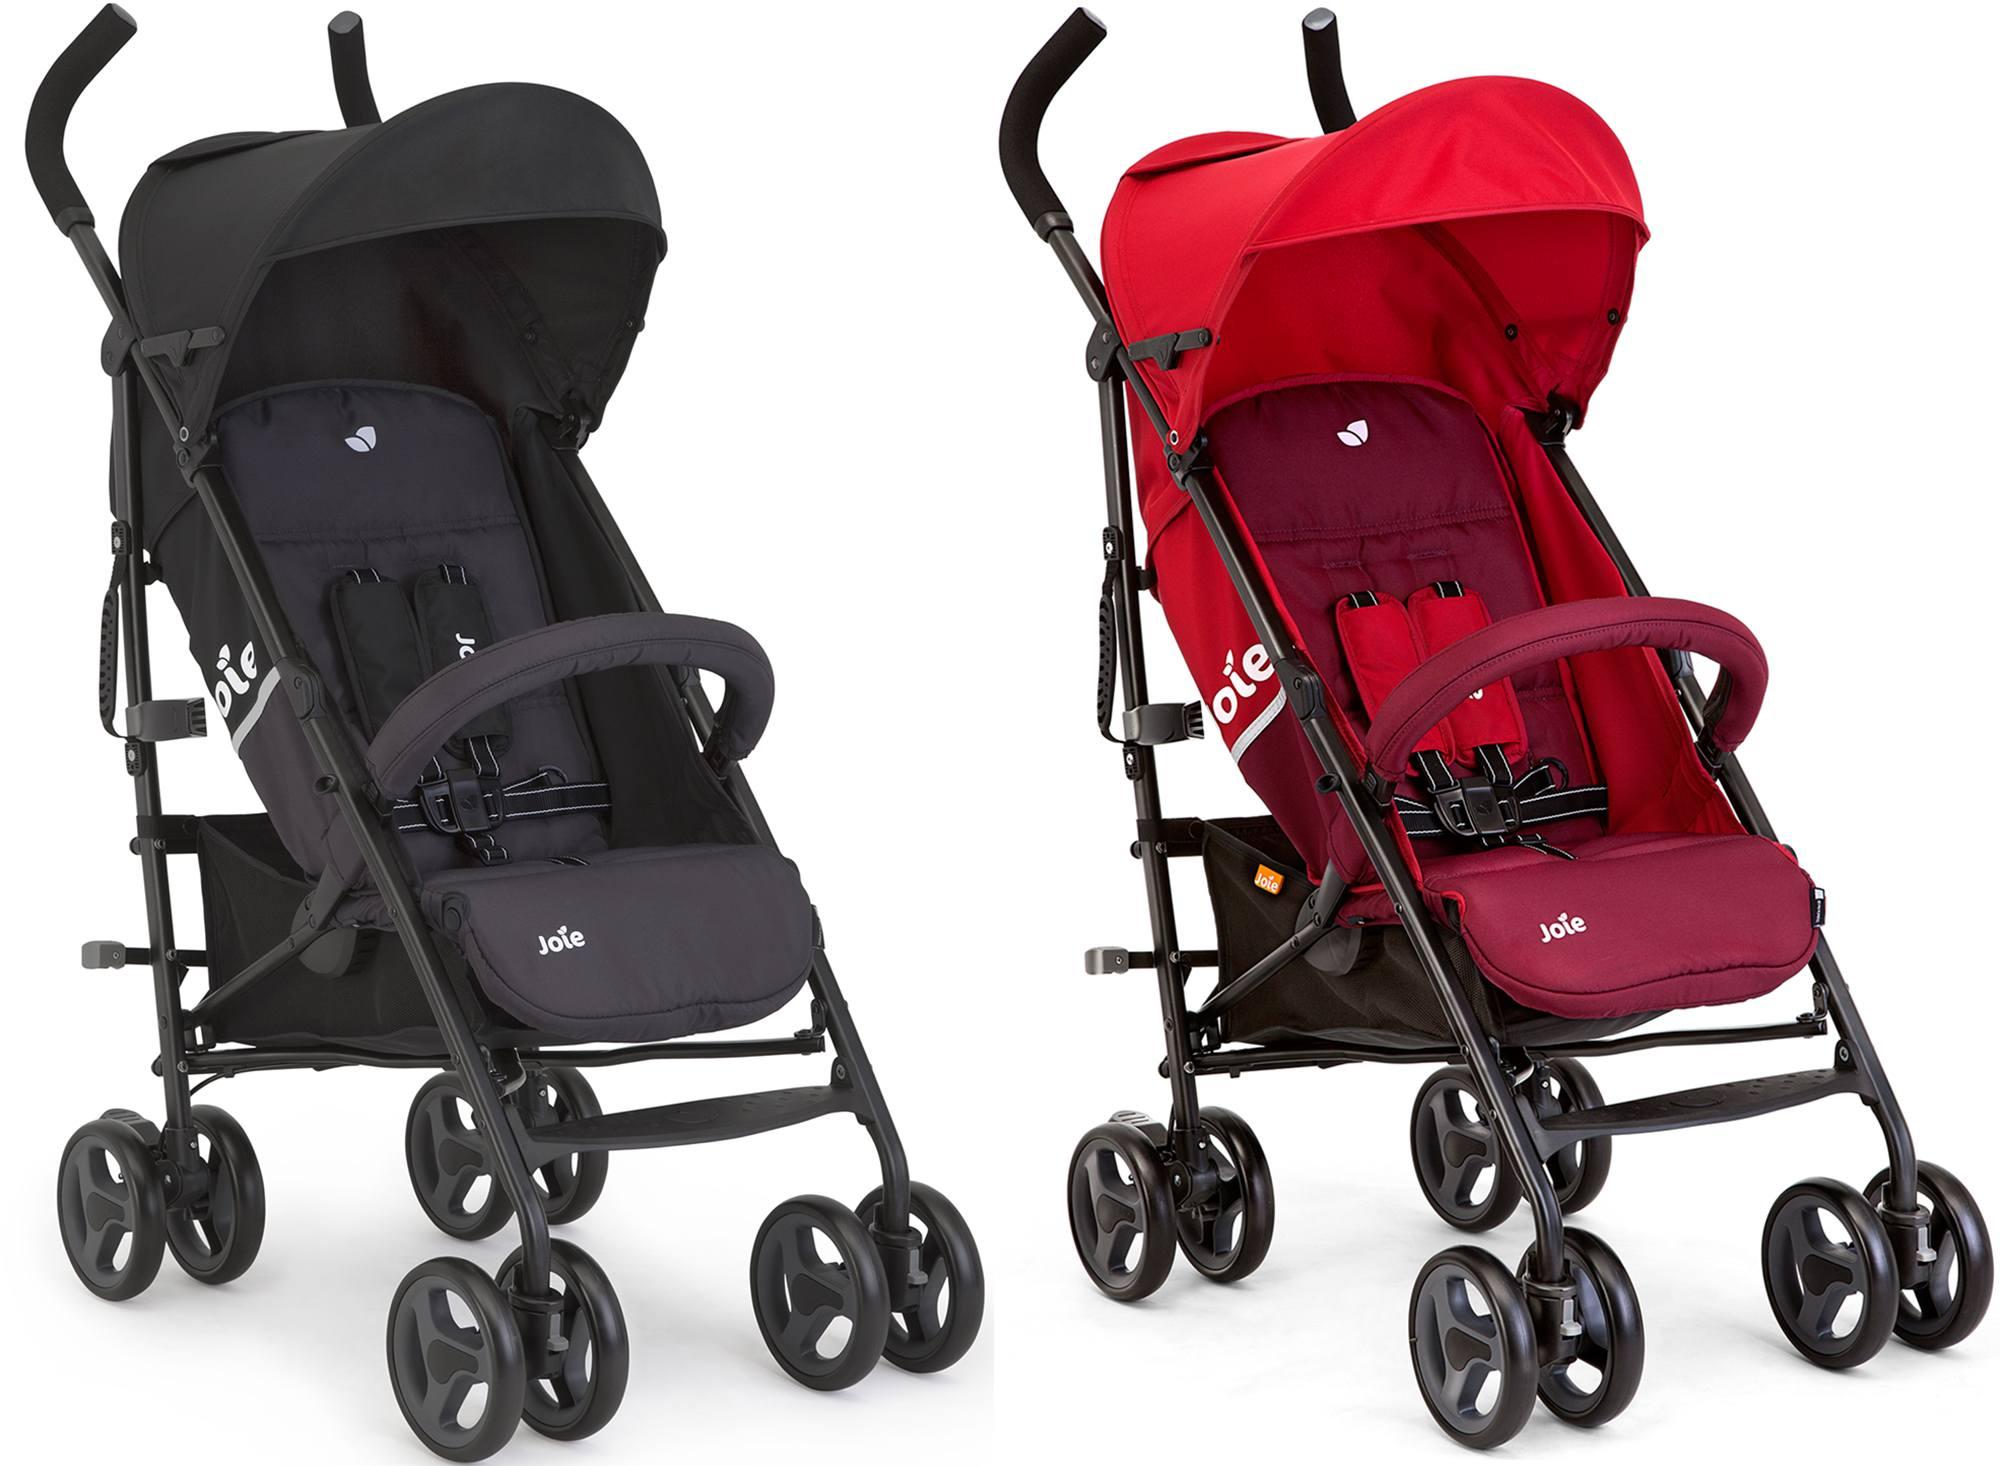 joie nitro lx stroller umbrella pushchair buggy baby toddler travel 0m bnib ebay. Black Bedroom Furniture Sets. Home Design Ideas